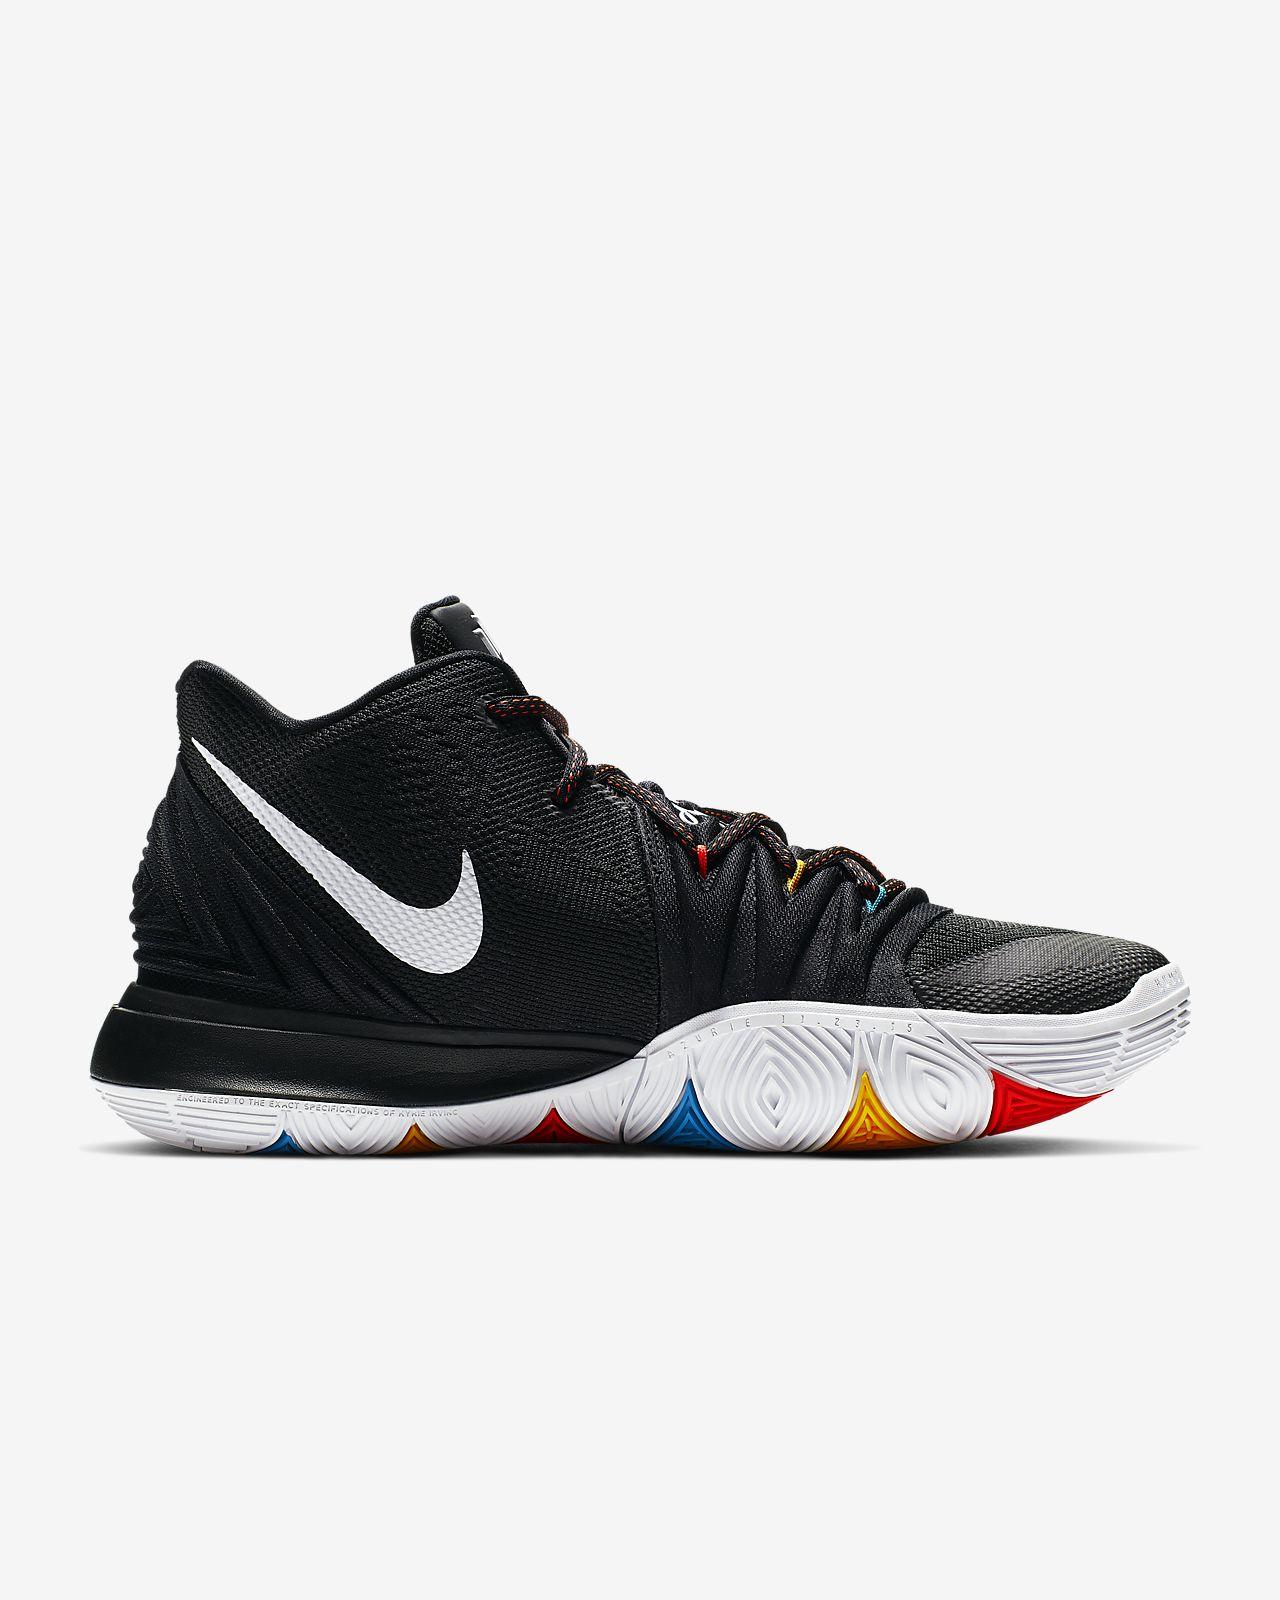 645e4e66b523 Kyrie 5 x Friends Basketball Shoe. Nike.com